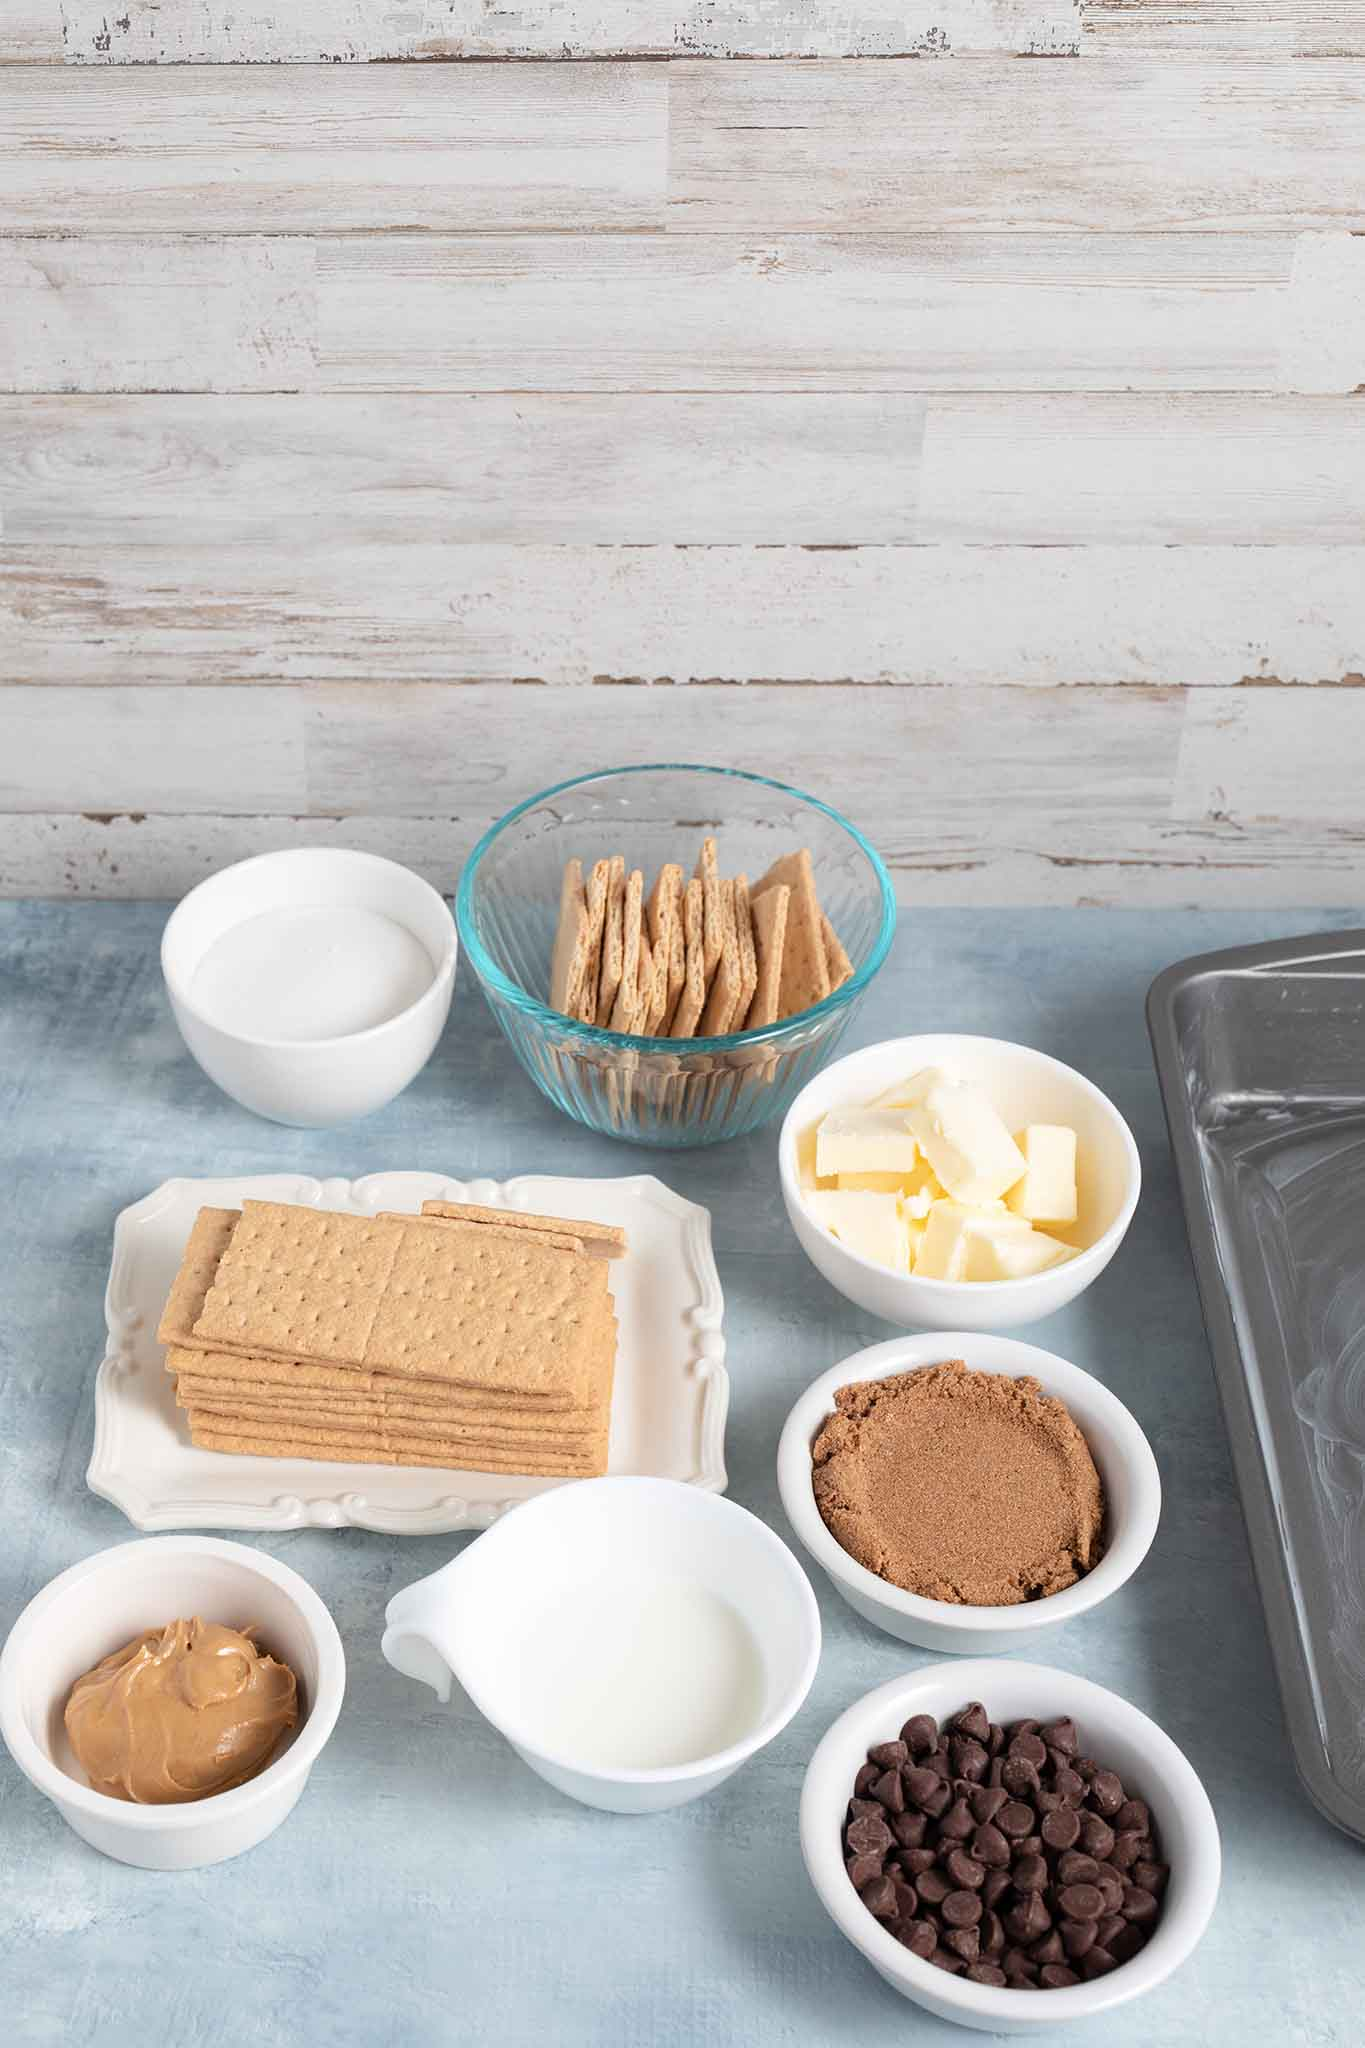 ingredients for no-bake bars